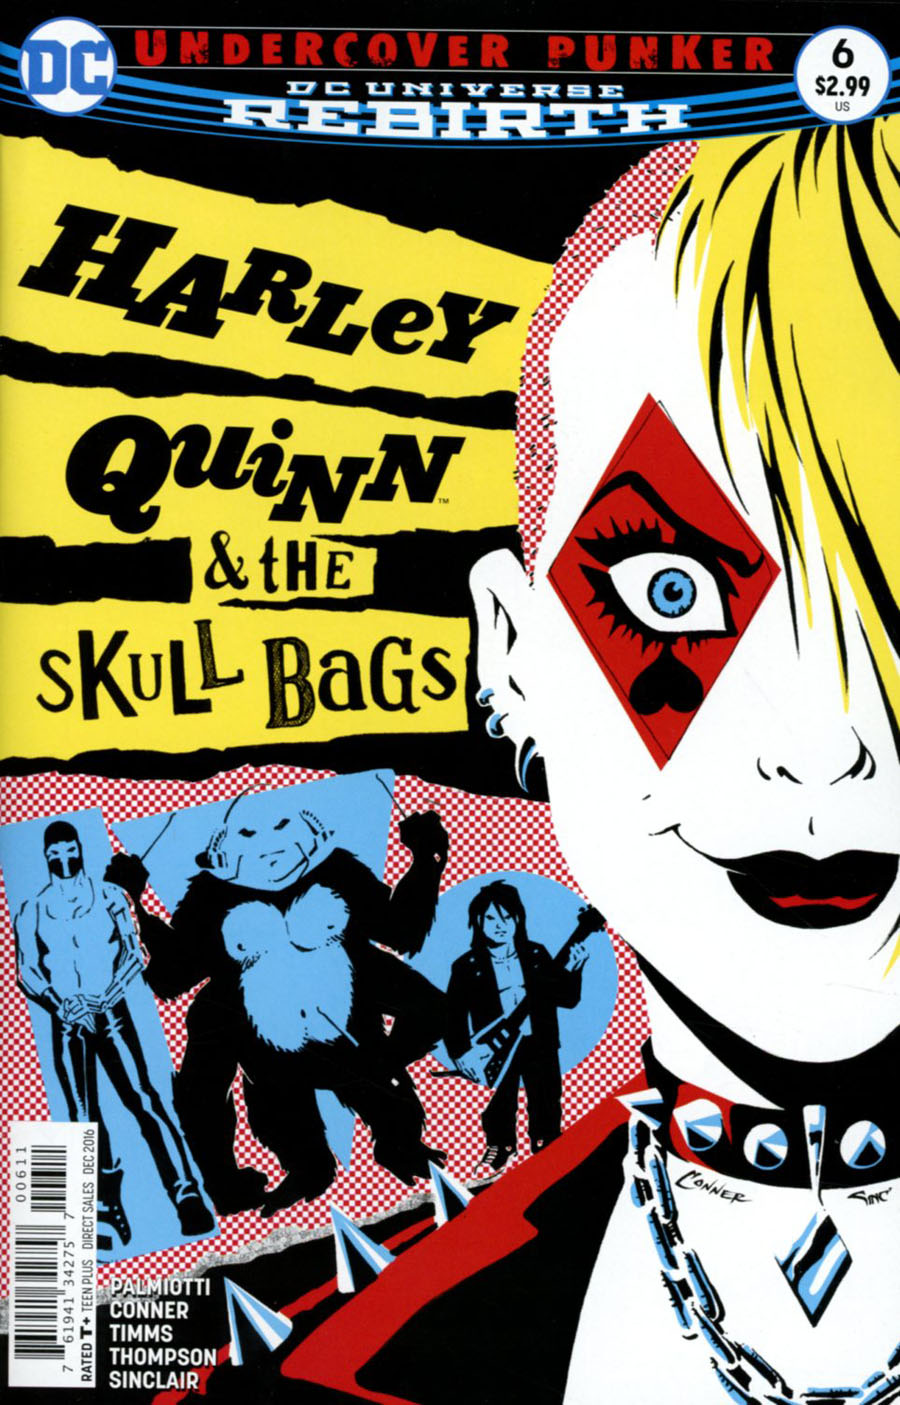 Harley Quinn Vol 3 #6 Cover A Regular Amanda Conner Cover